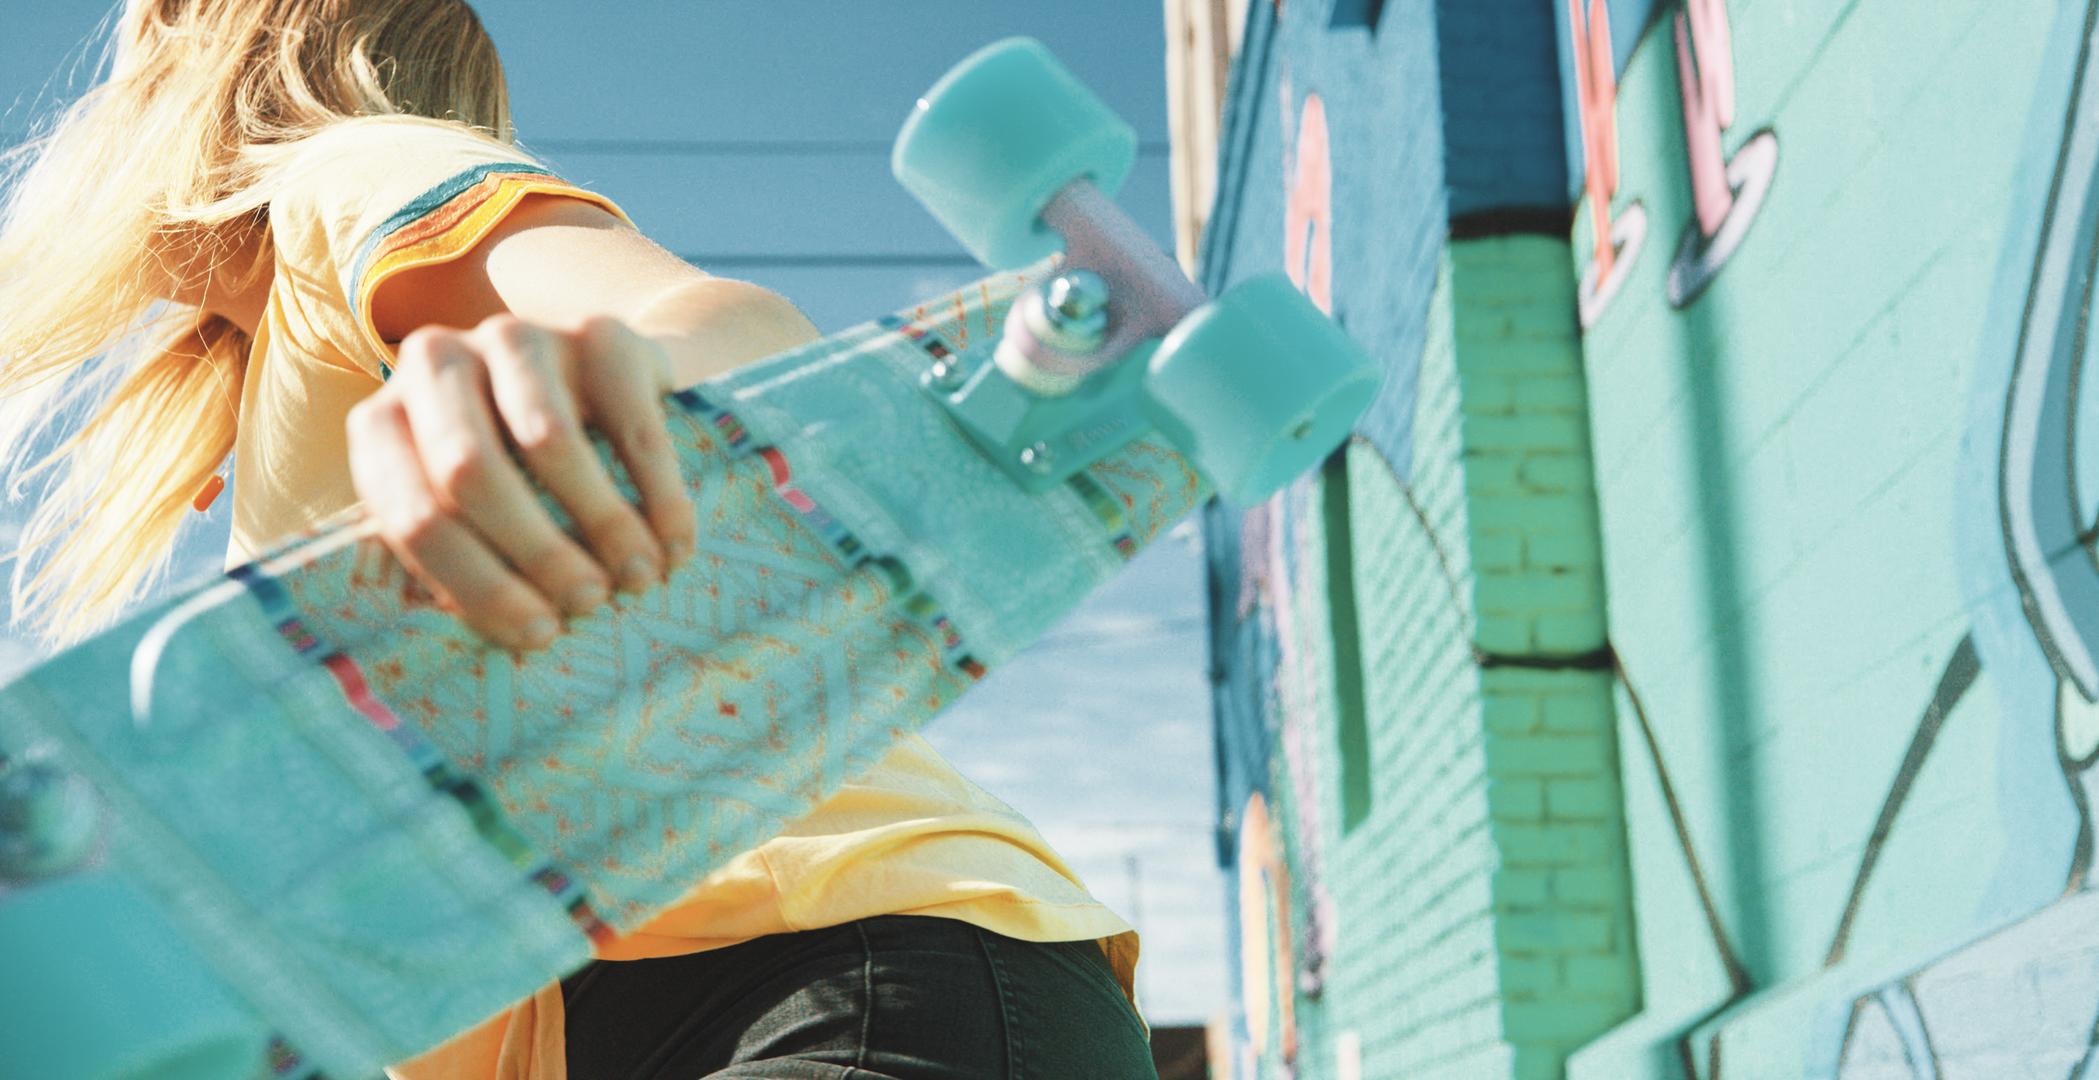 penny-skateboards-social-media-chrilleks